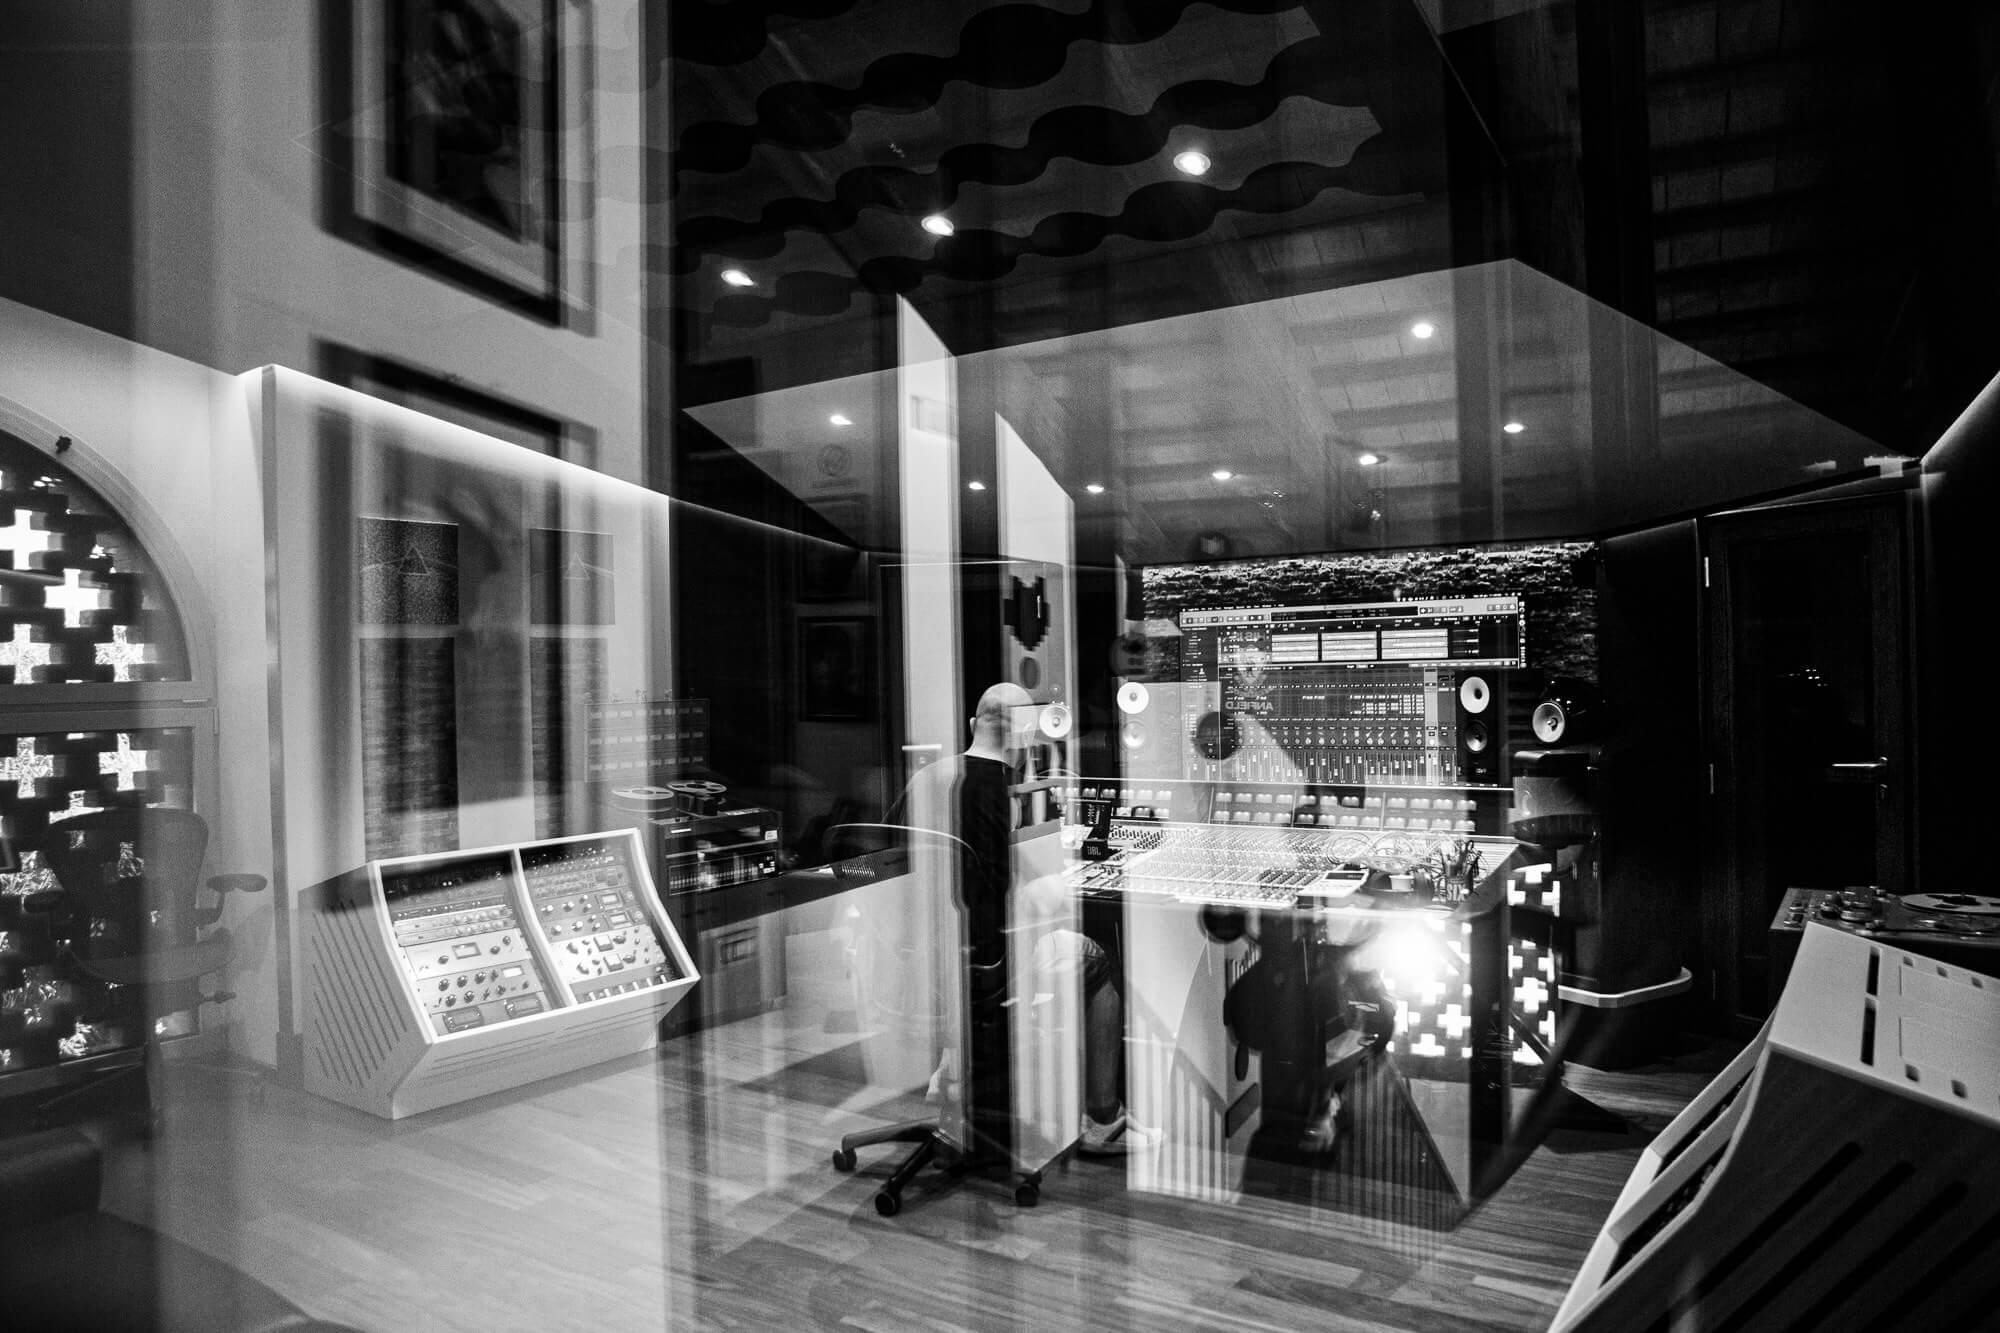 kalimba-studio-registrazione-padova